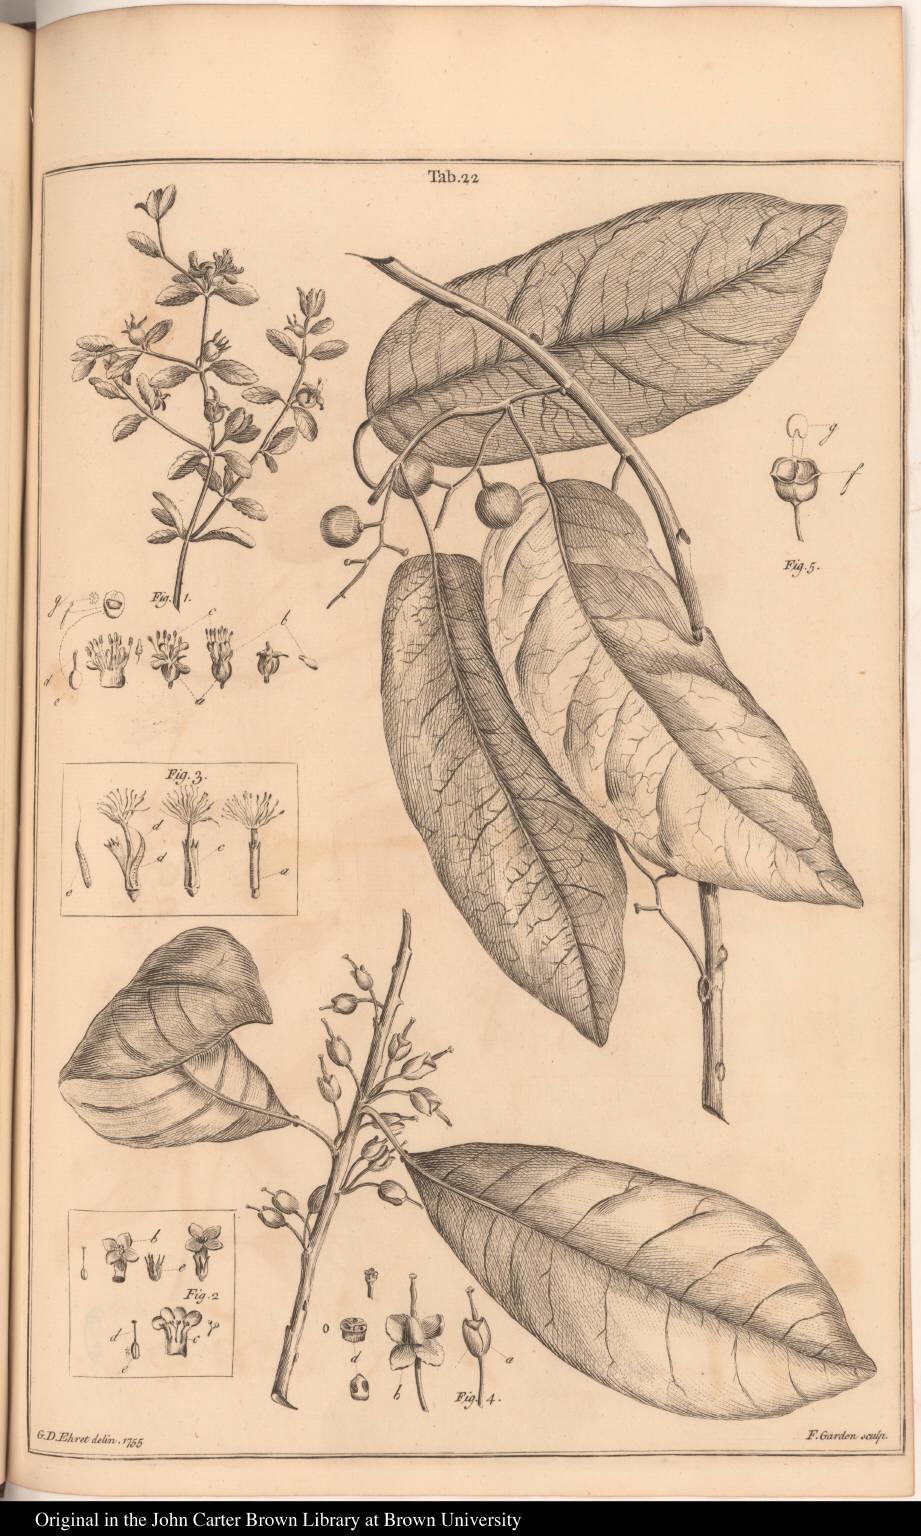 [Acisanthera, Stemodiacra, Zygia, Omphalandria, and Vimen]